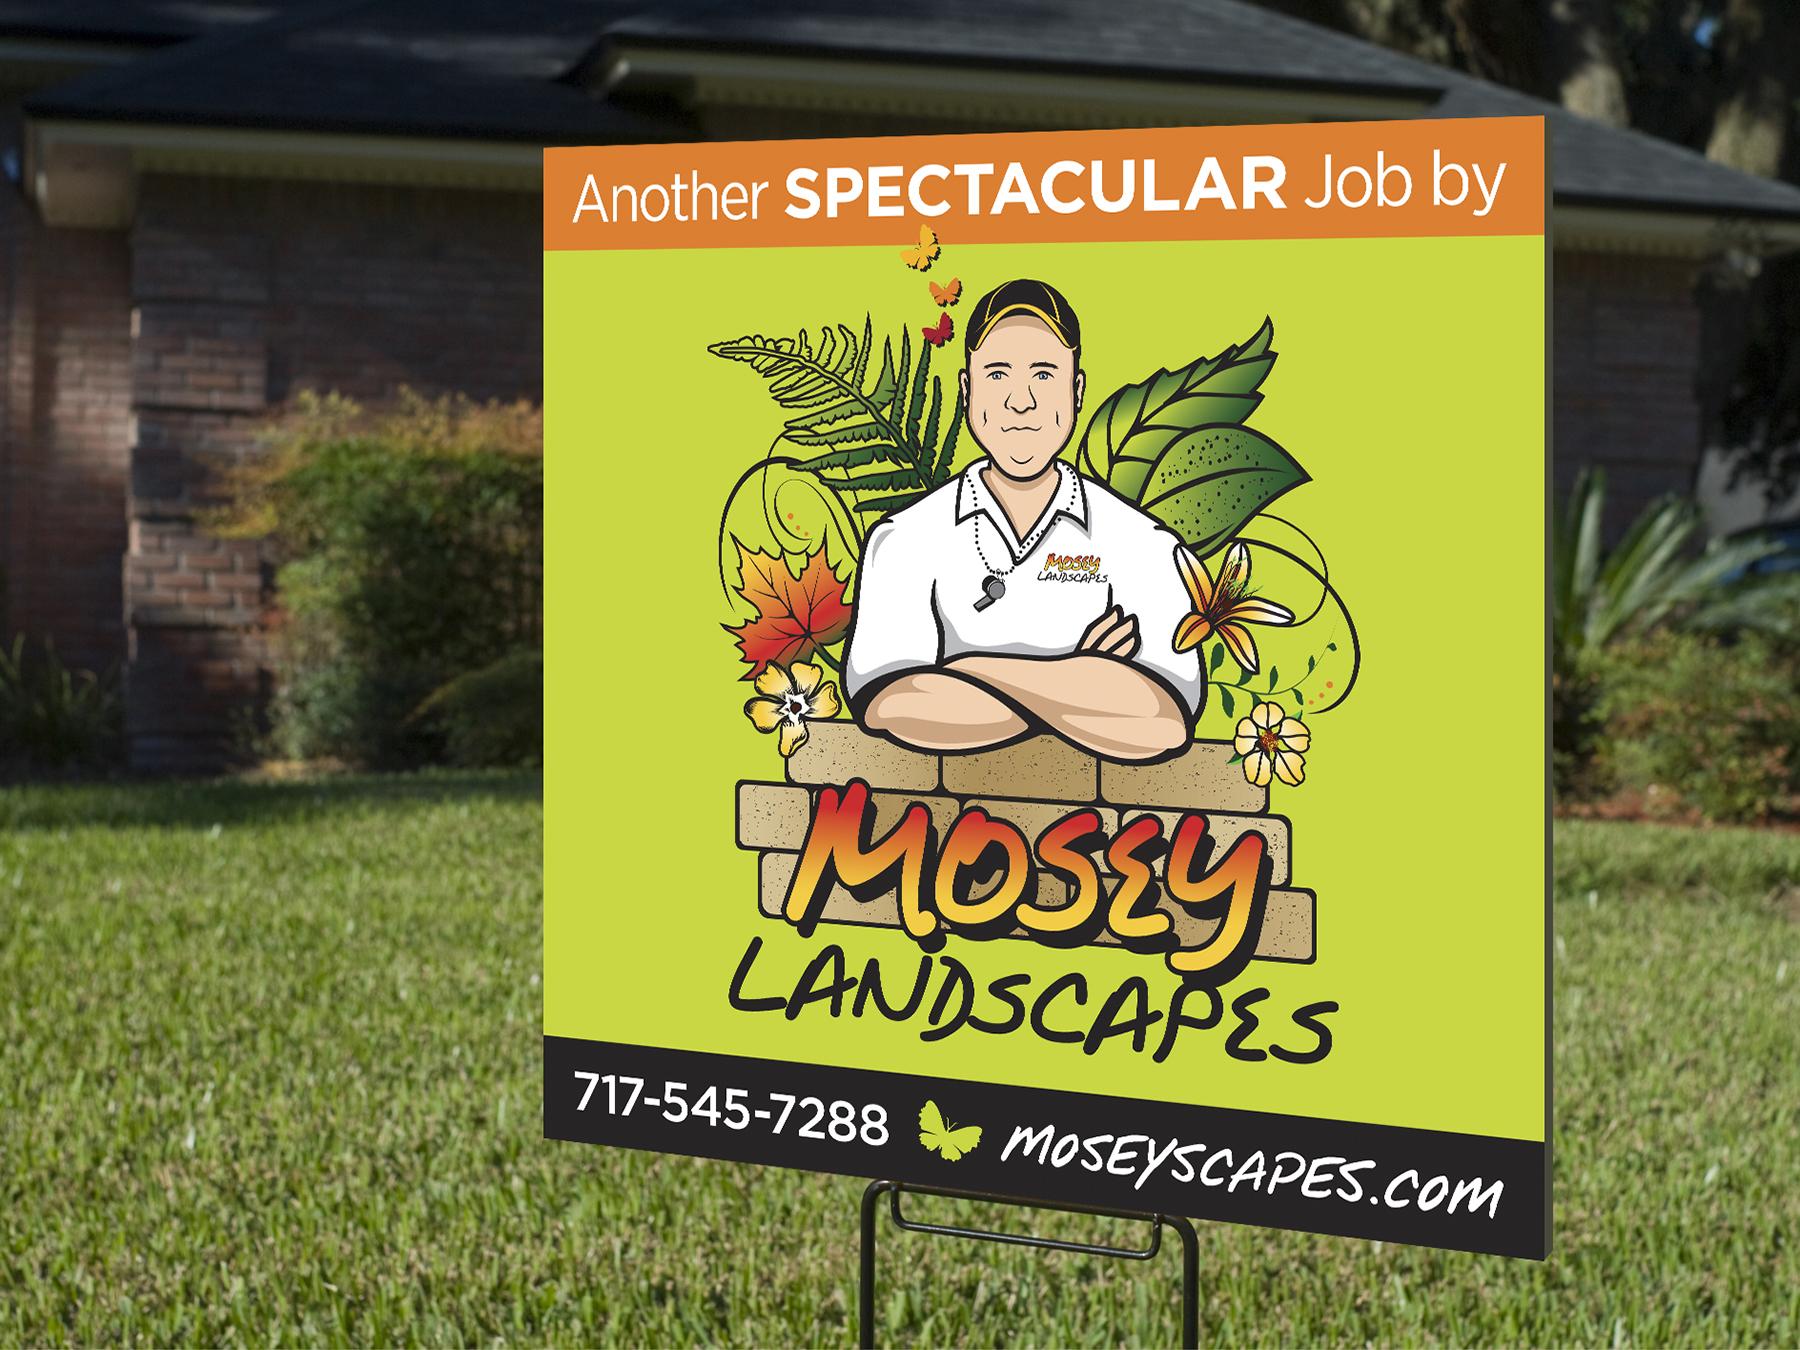 https://www.odessadesign.com/wp-content/uploads/2021/10/mosey-yard-sign_3.jpg